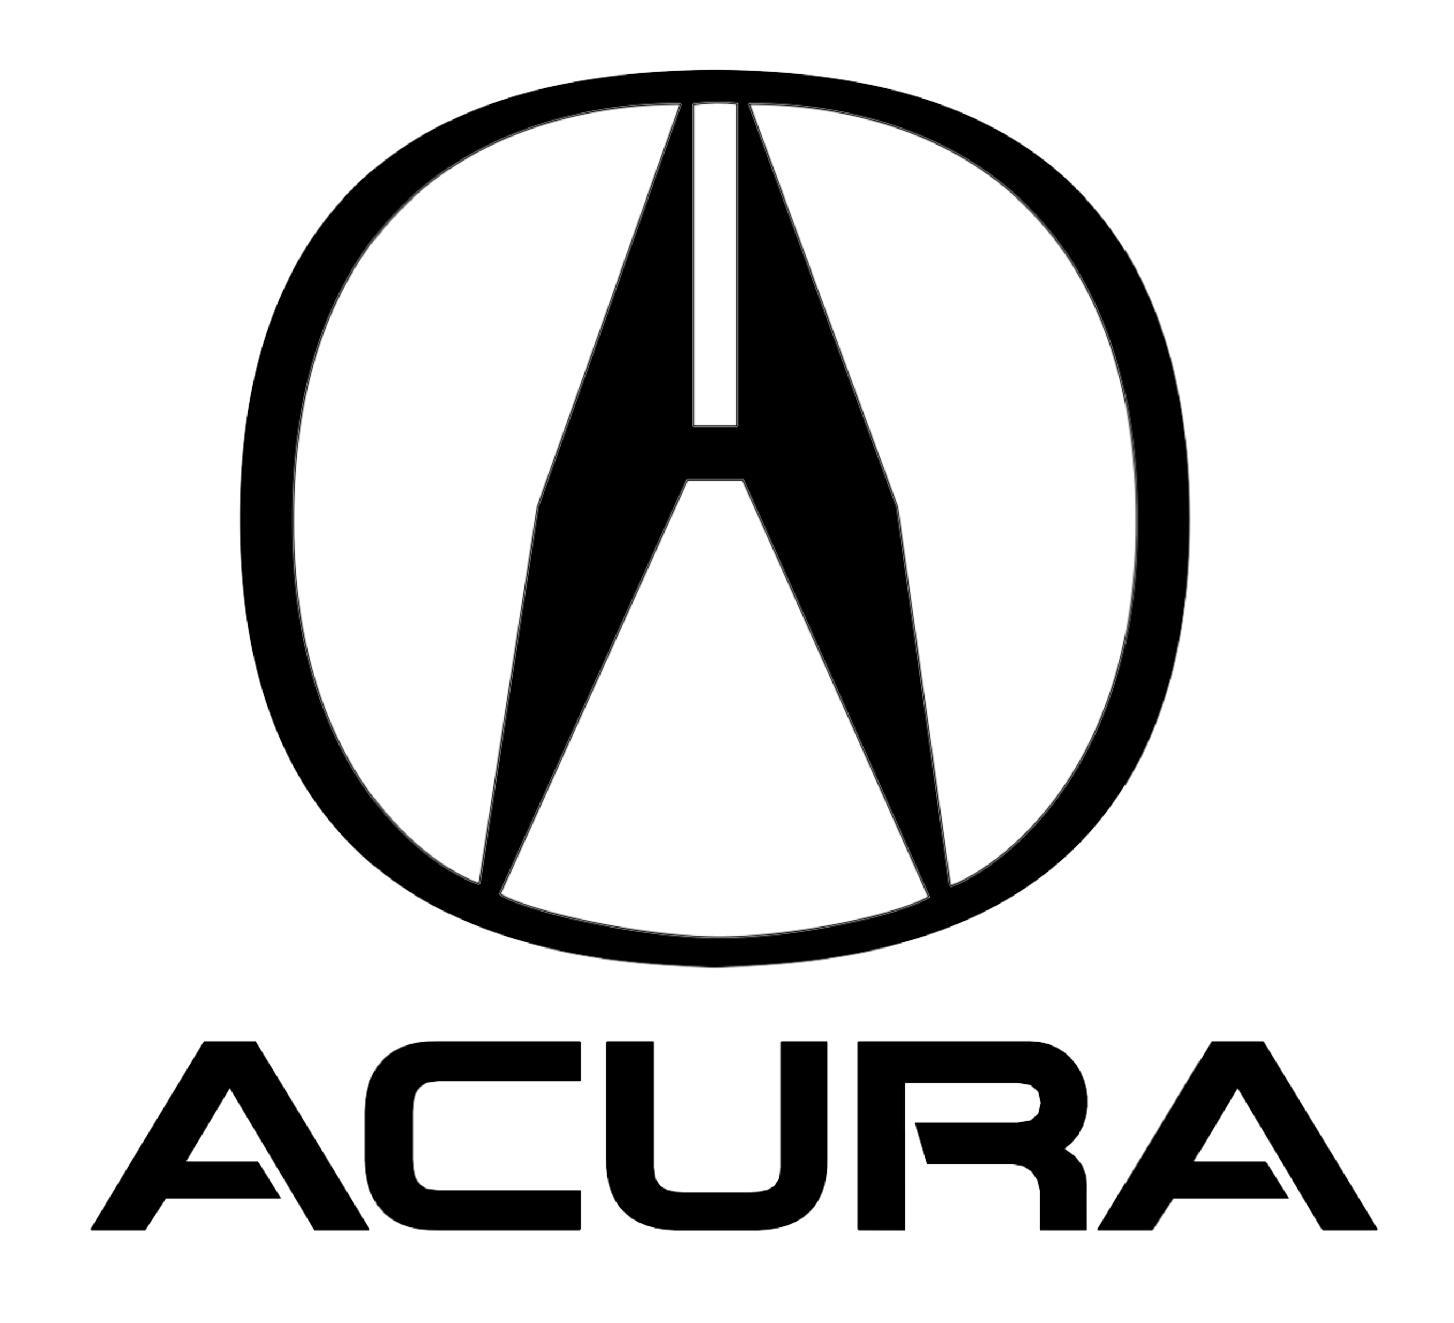 Acura Logo Acura Car Symbol Meaning And History